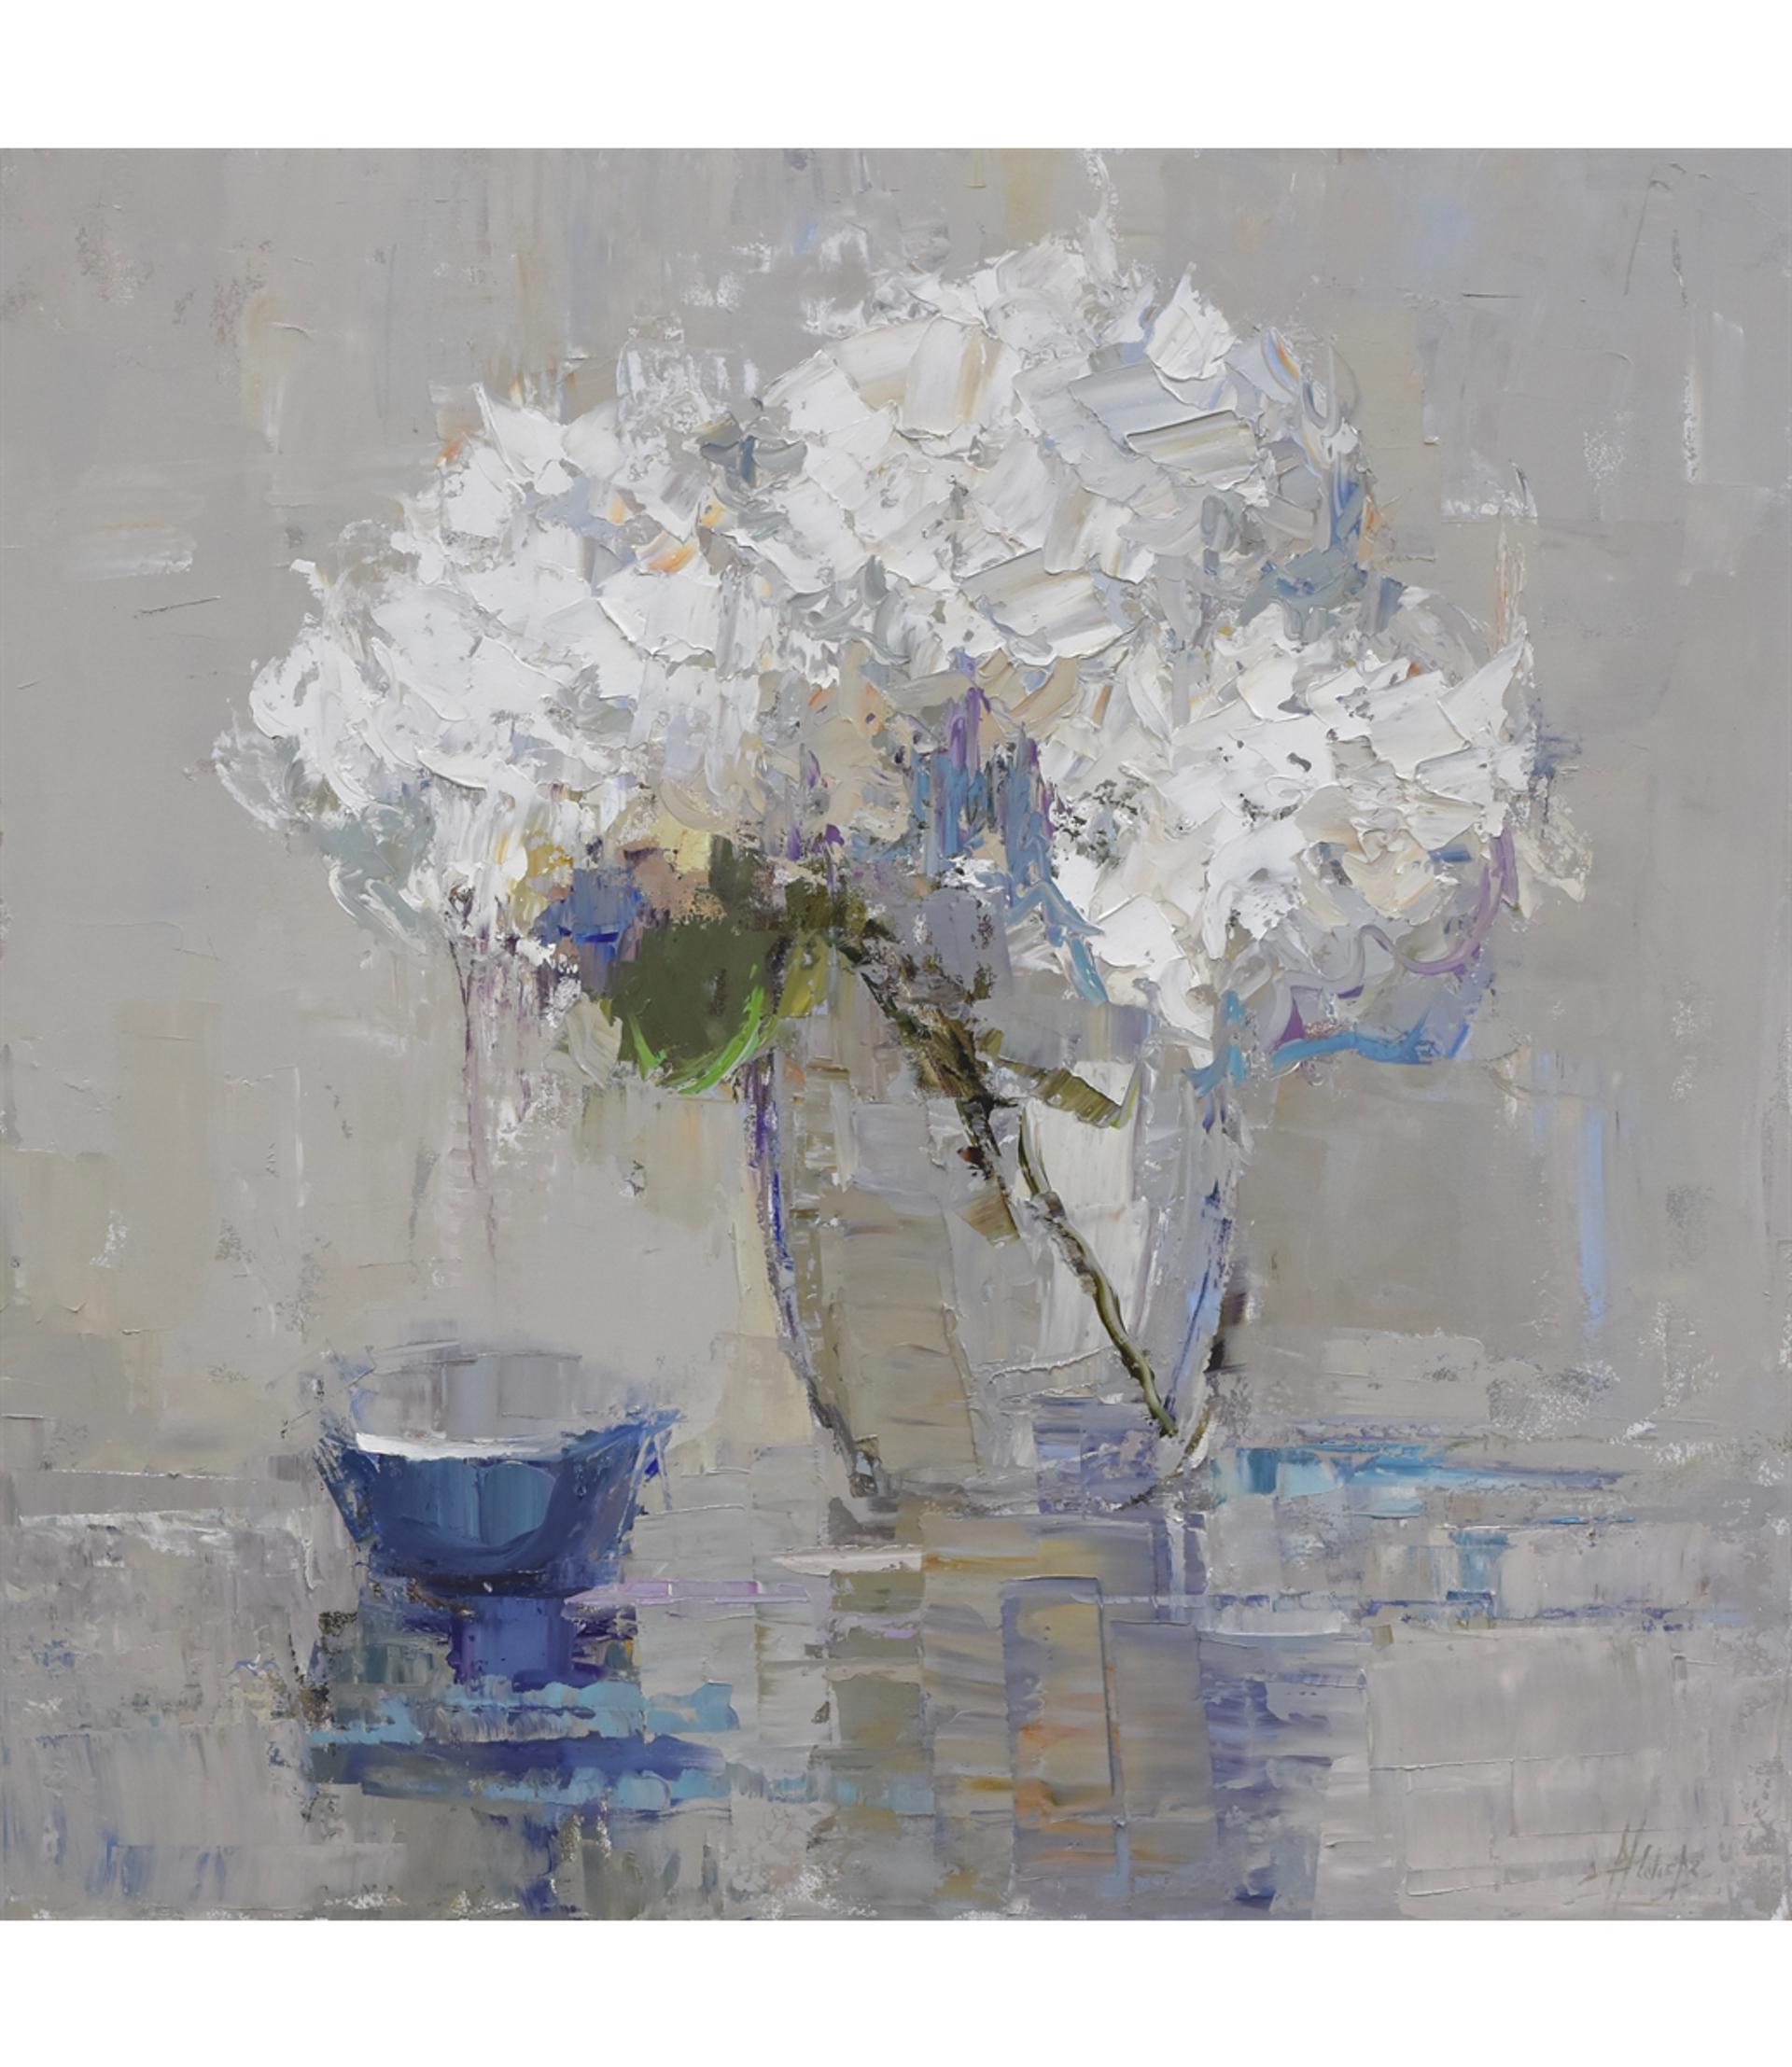 Blue Bowl and Hydrangeas by Barbara Flowers